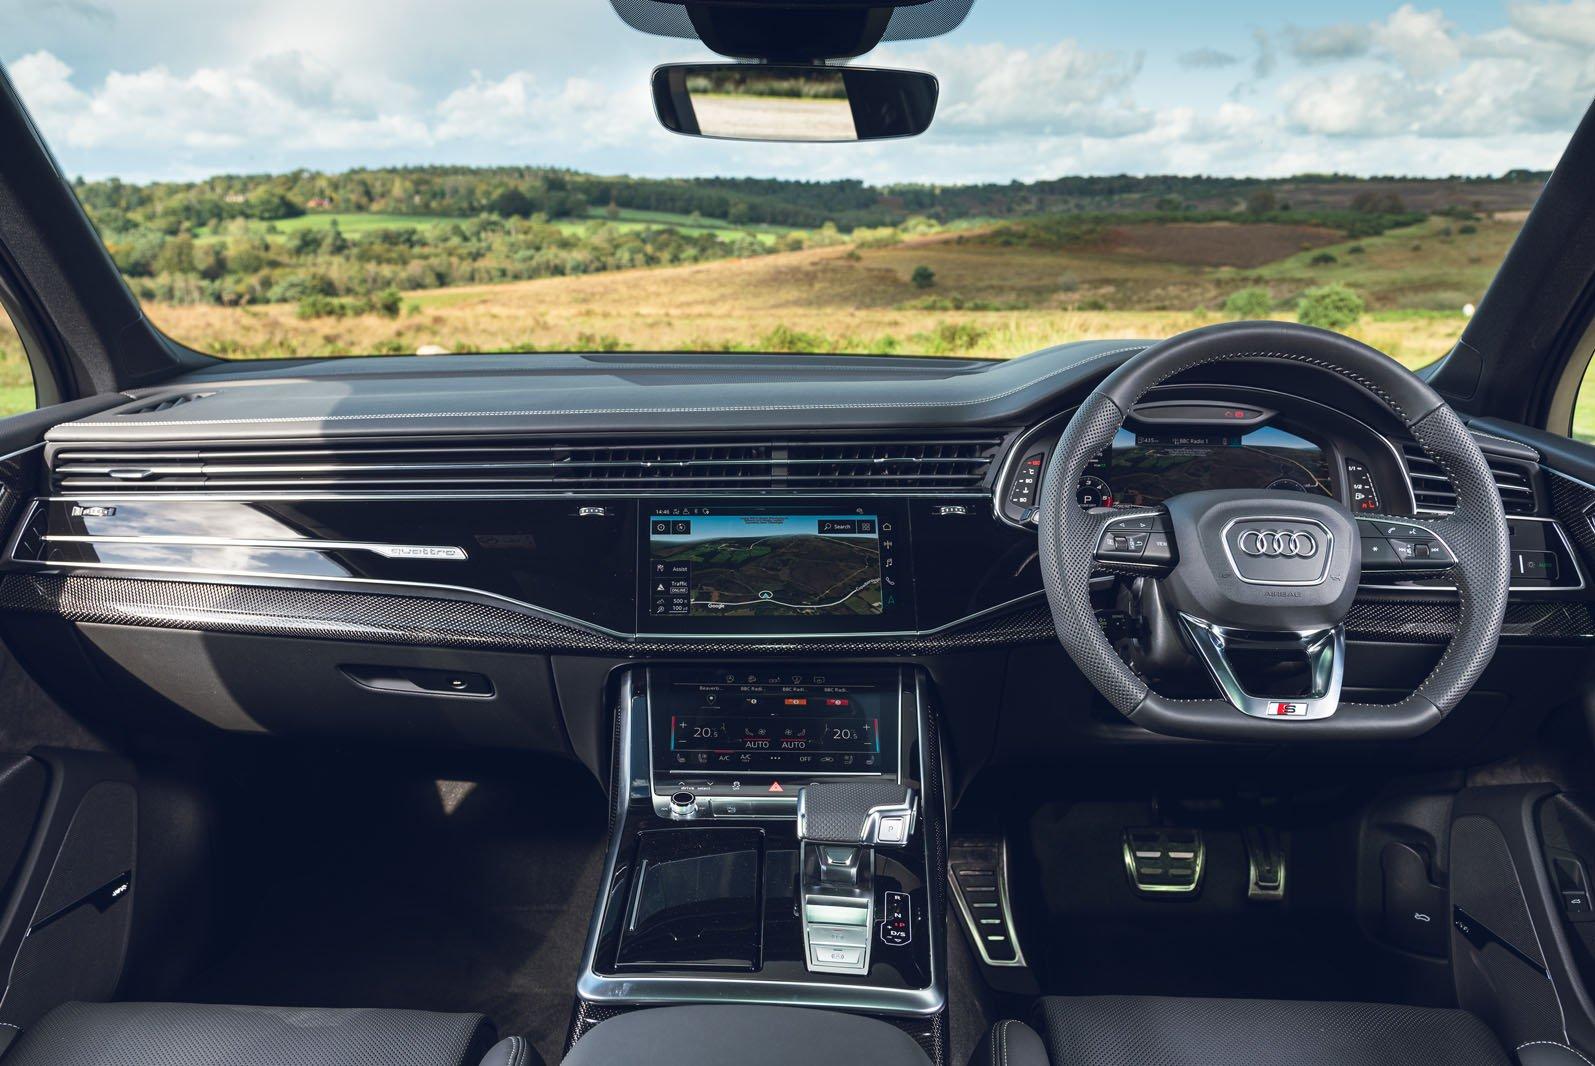 Audi SQ7 2021 dashboard